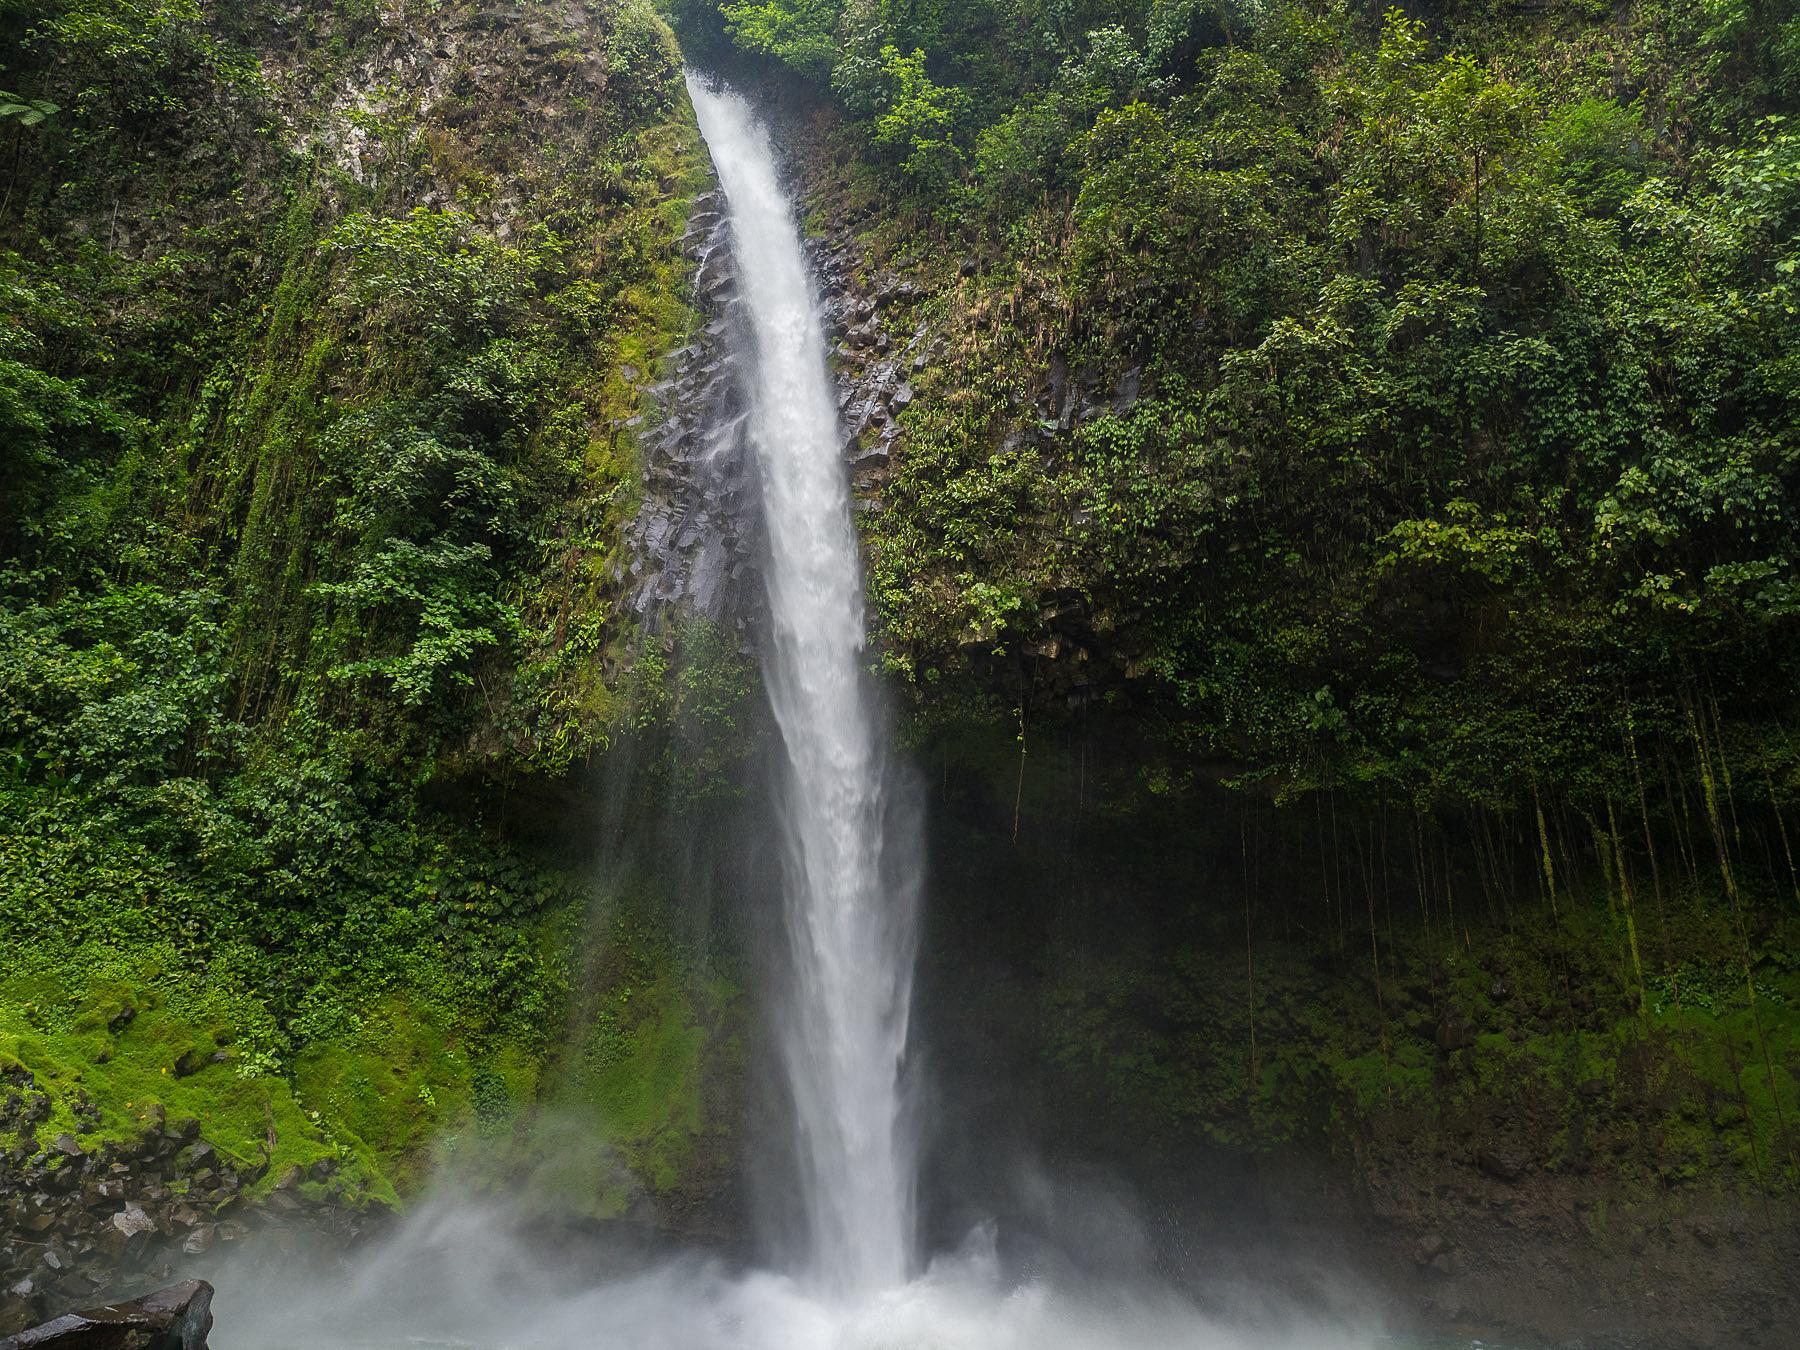 La Fortuna Wasserfall wie aus dem Bilderbuch